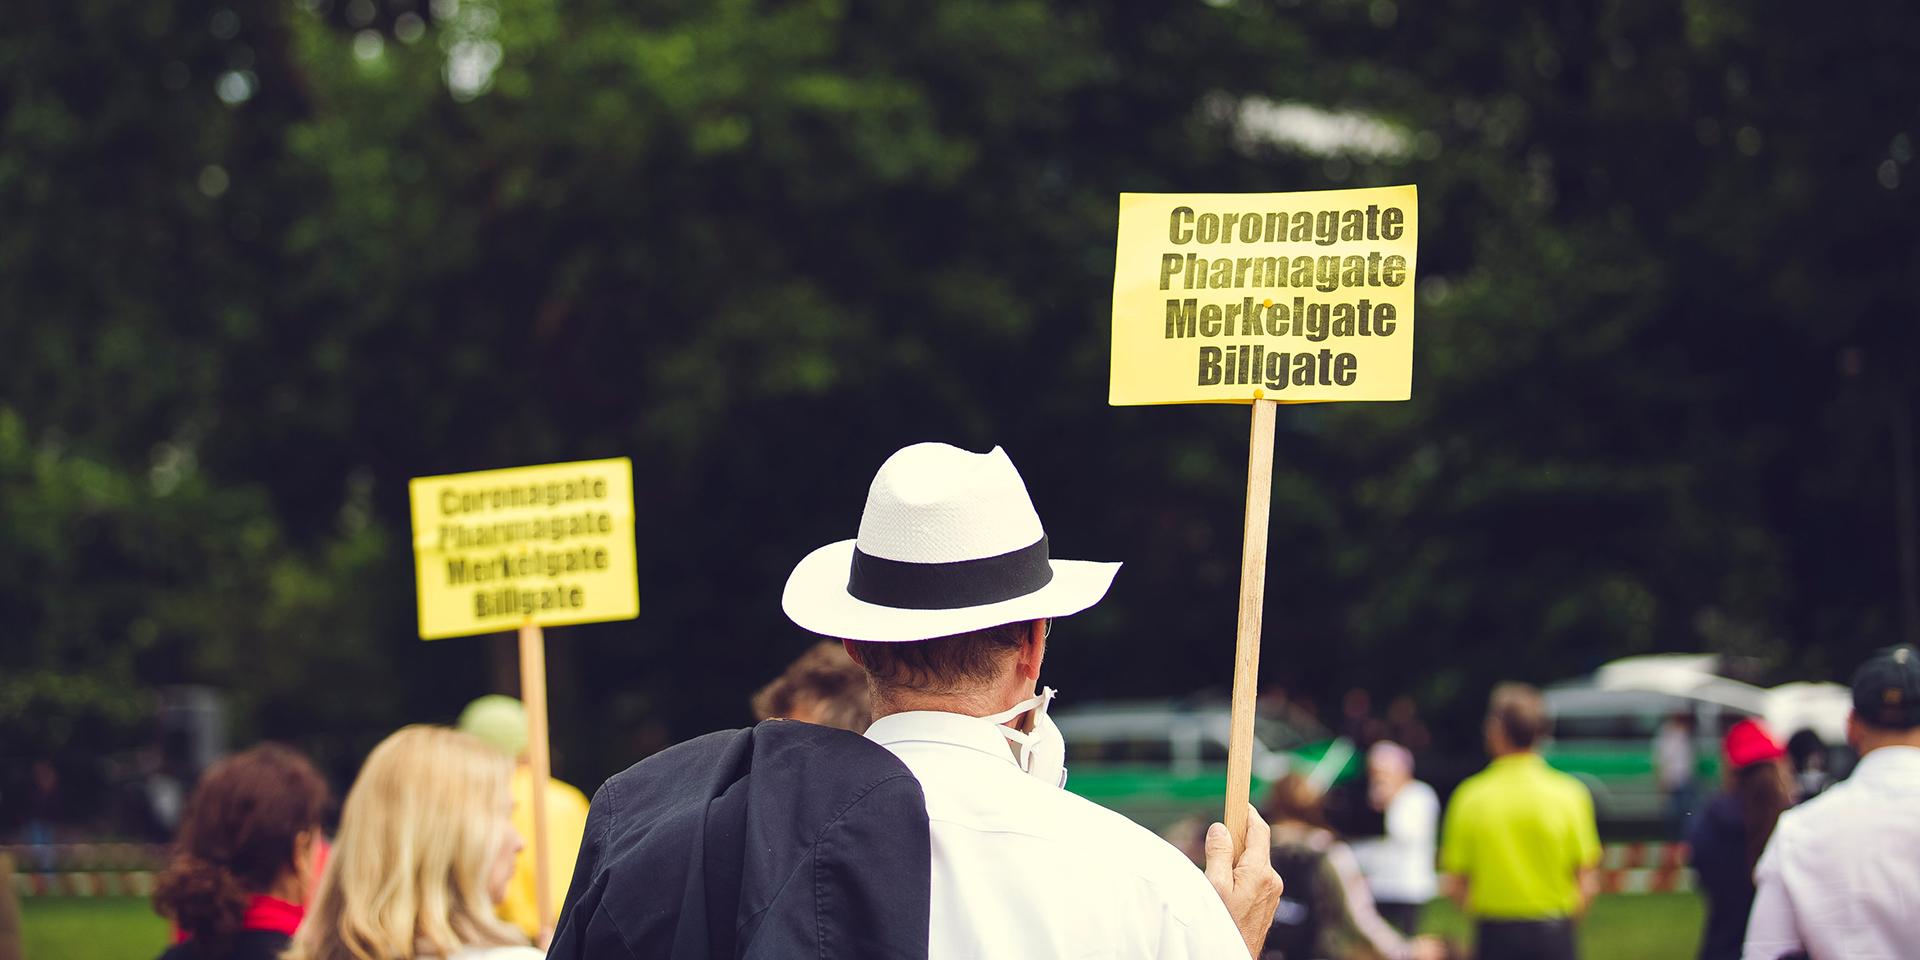 Demonstrant mit einem Plakat gegen Corona-Maßnahmen